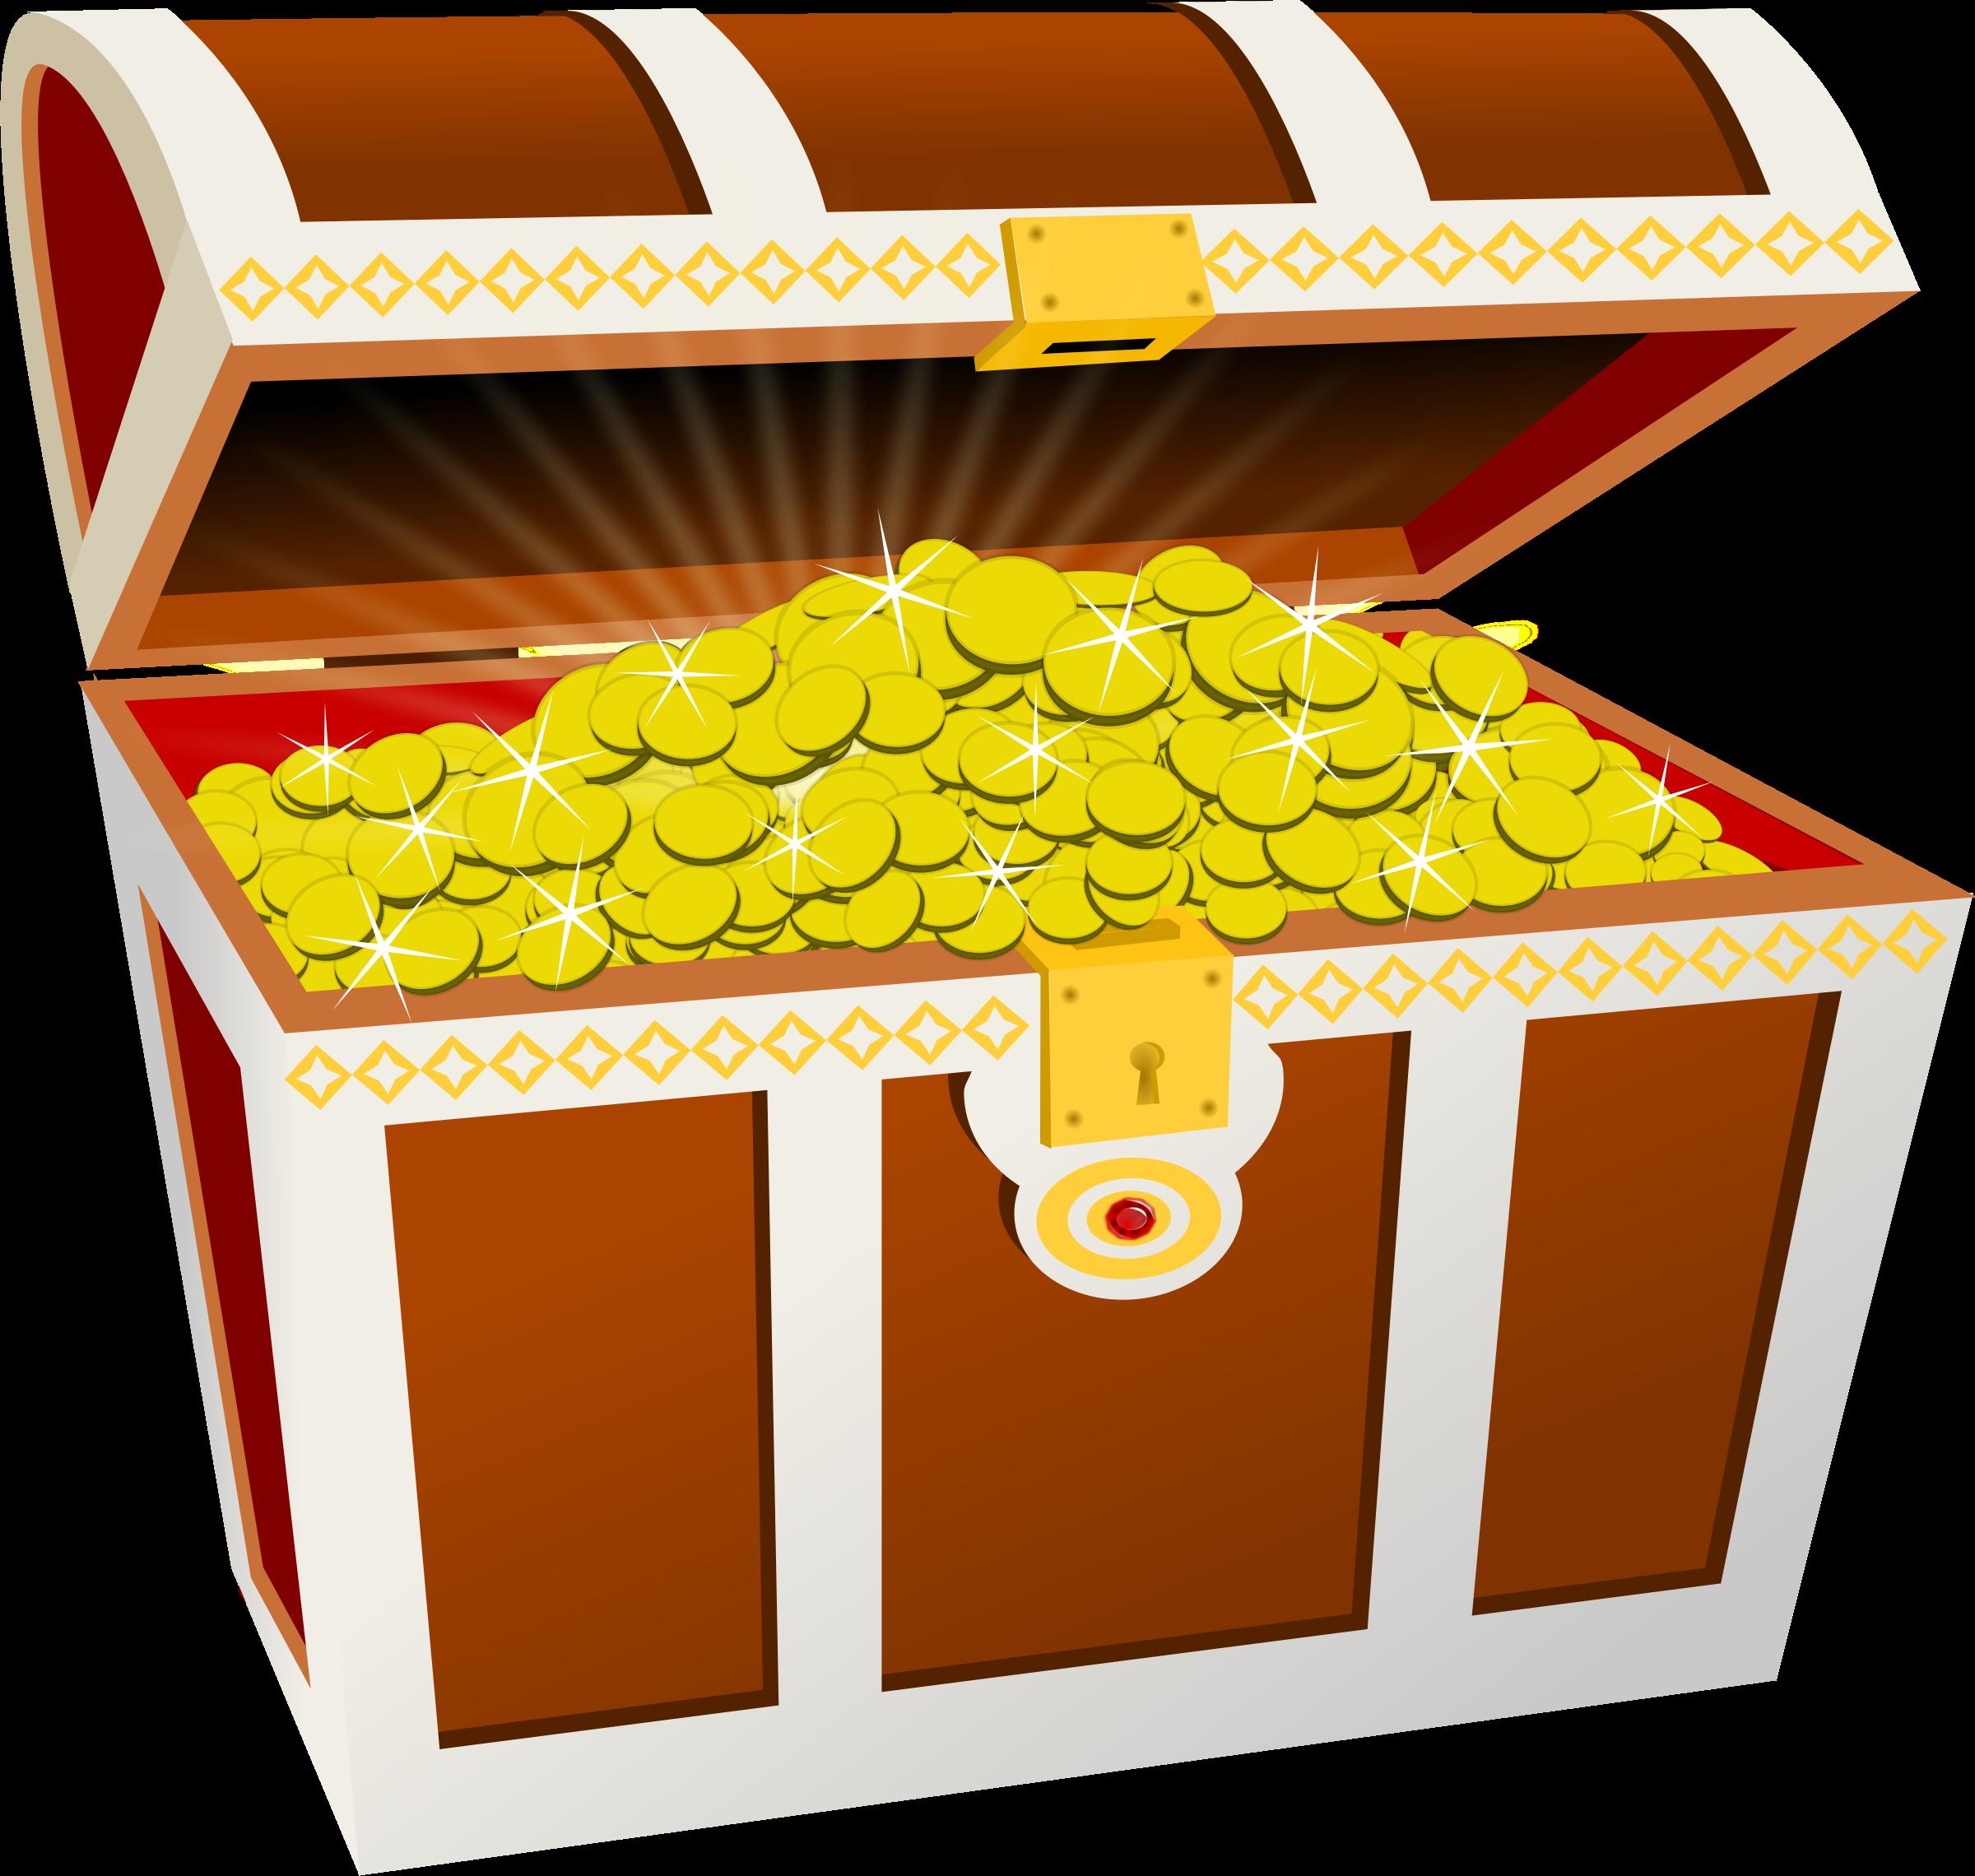 Treasure Chest Clip Art Image ... BIG IMAGE (PNG)